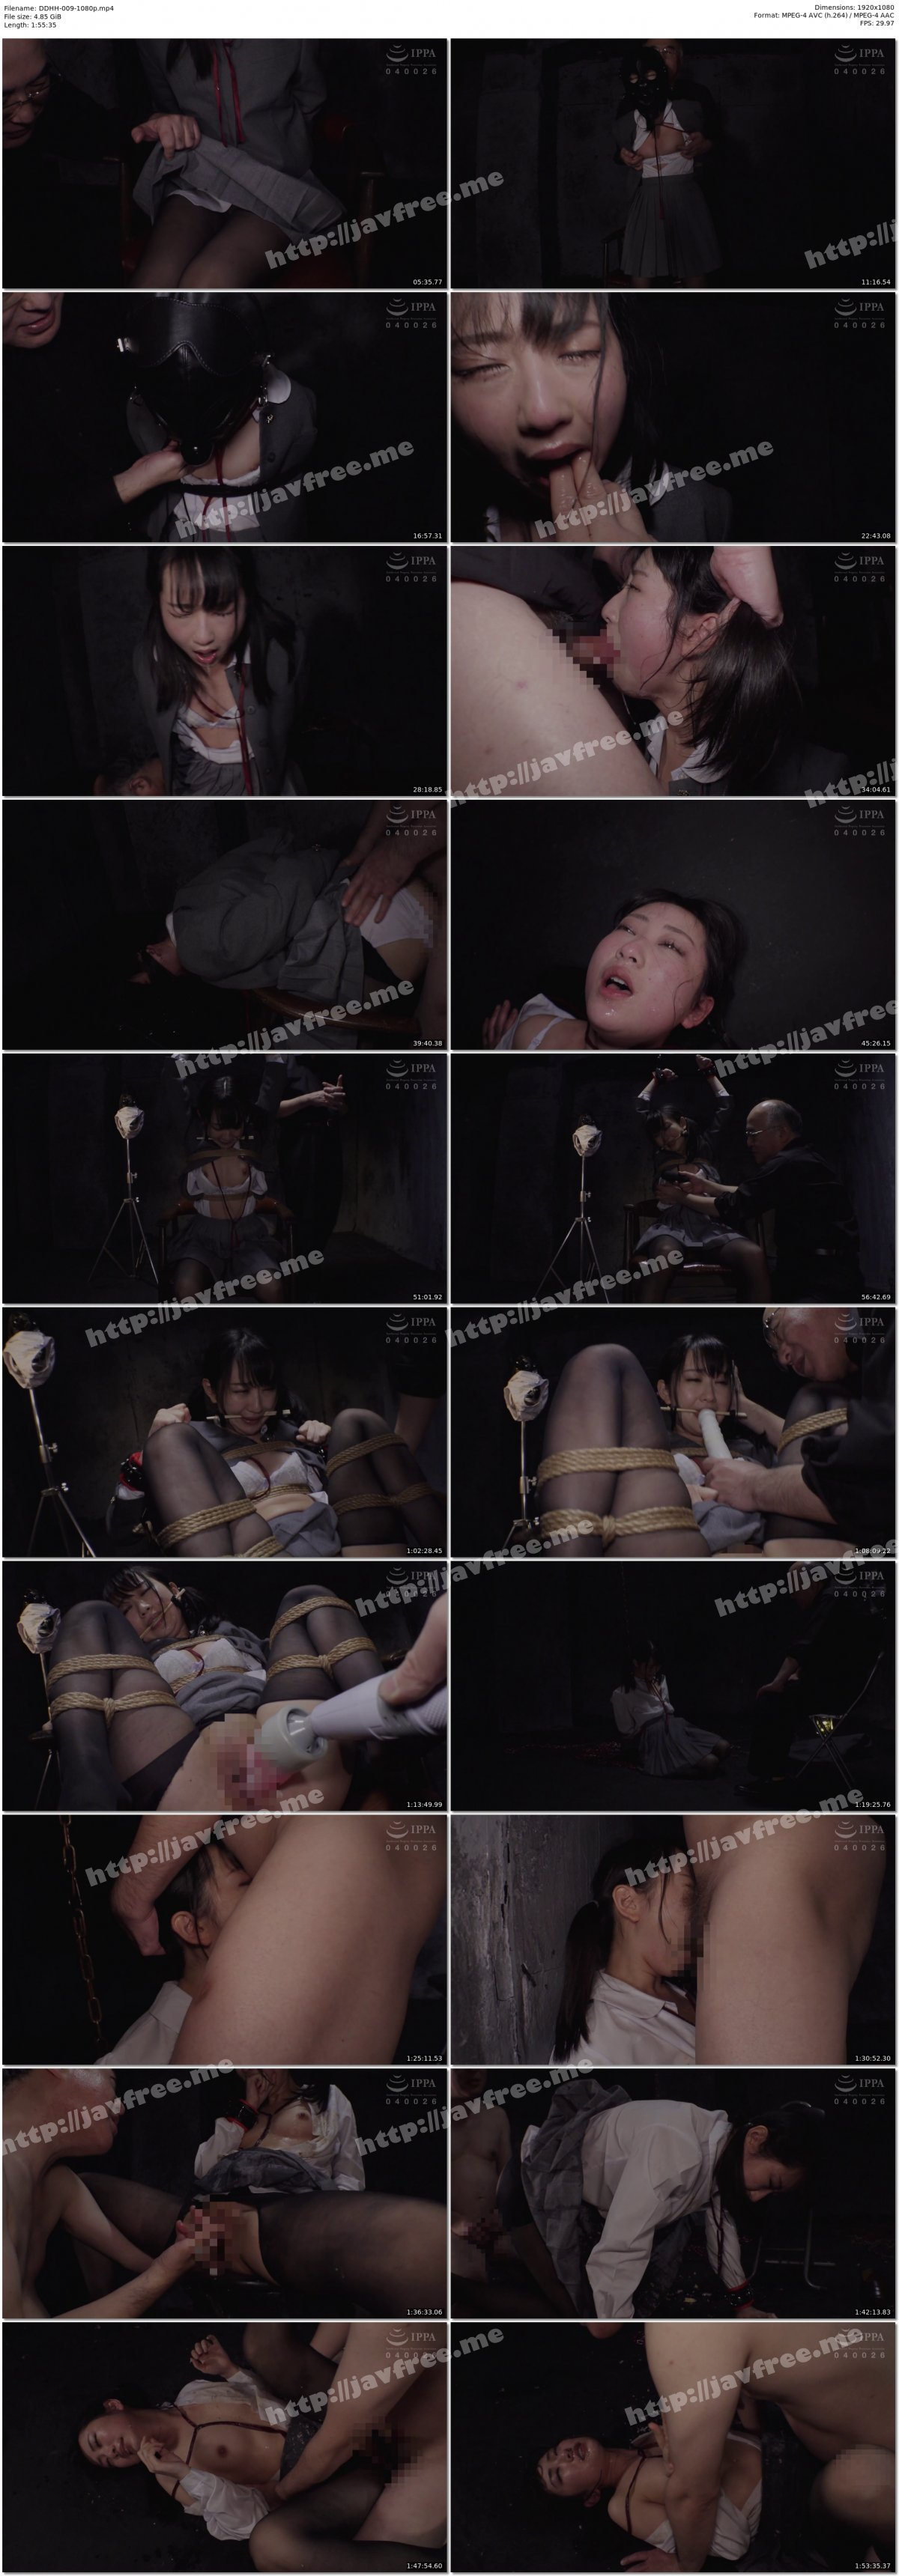 [HD][DDHH-009] 監禁~男の性奴●になった私~ 神坂ひなの